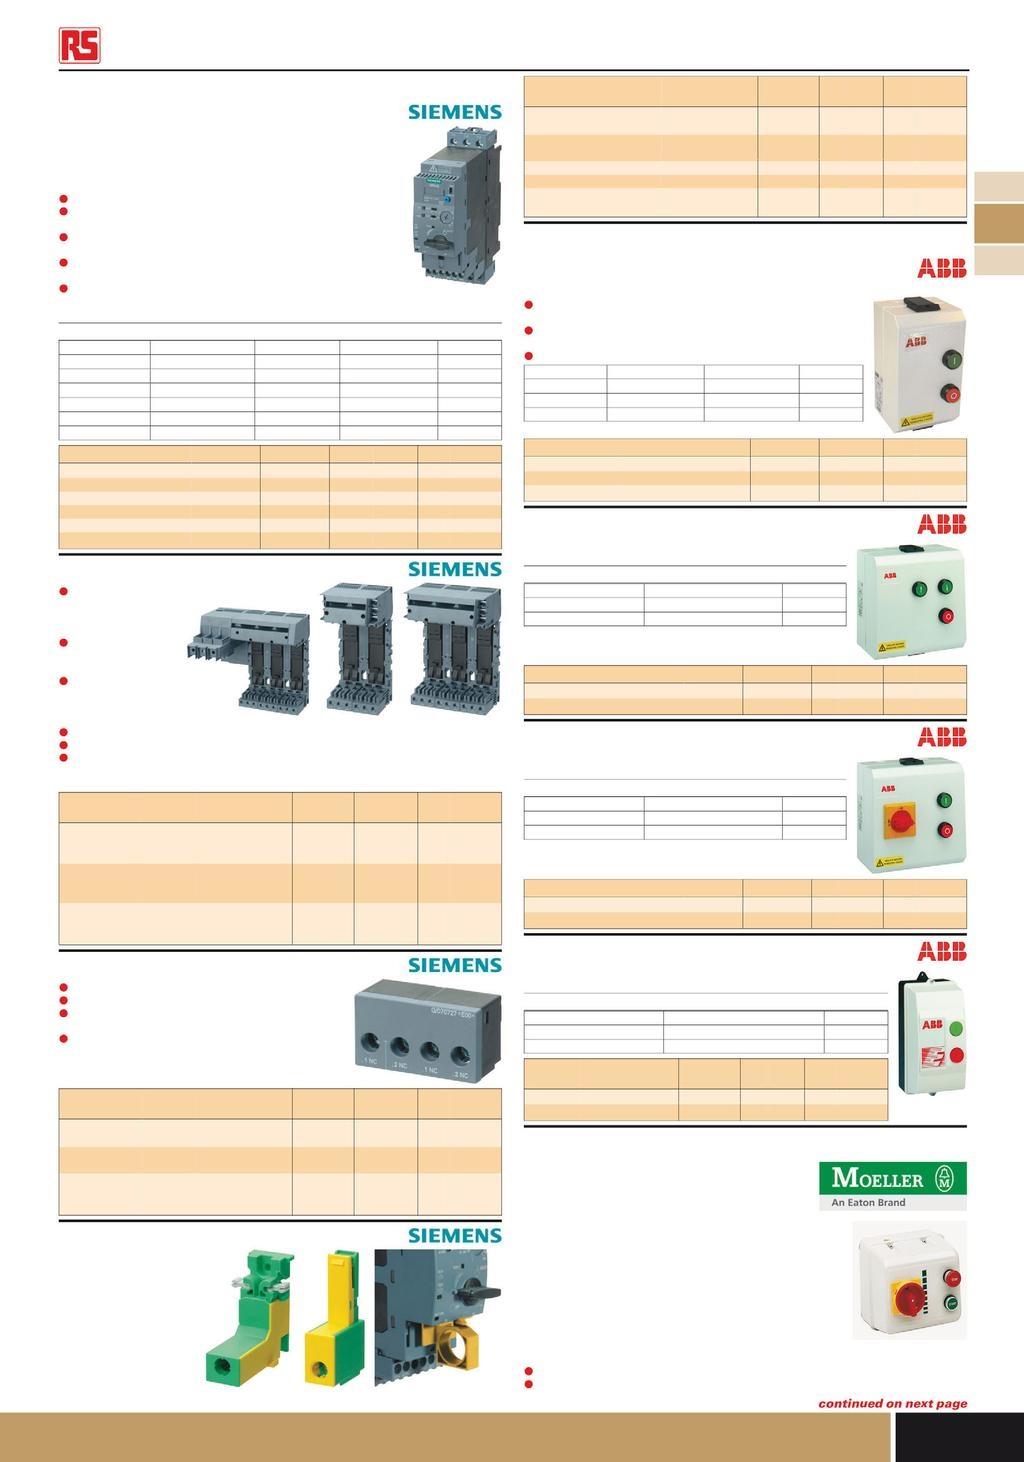 Pnoz S C Wiring Diagram on